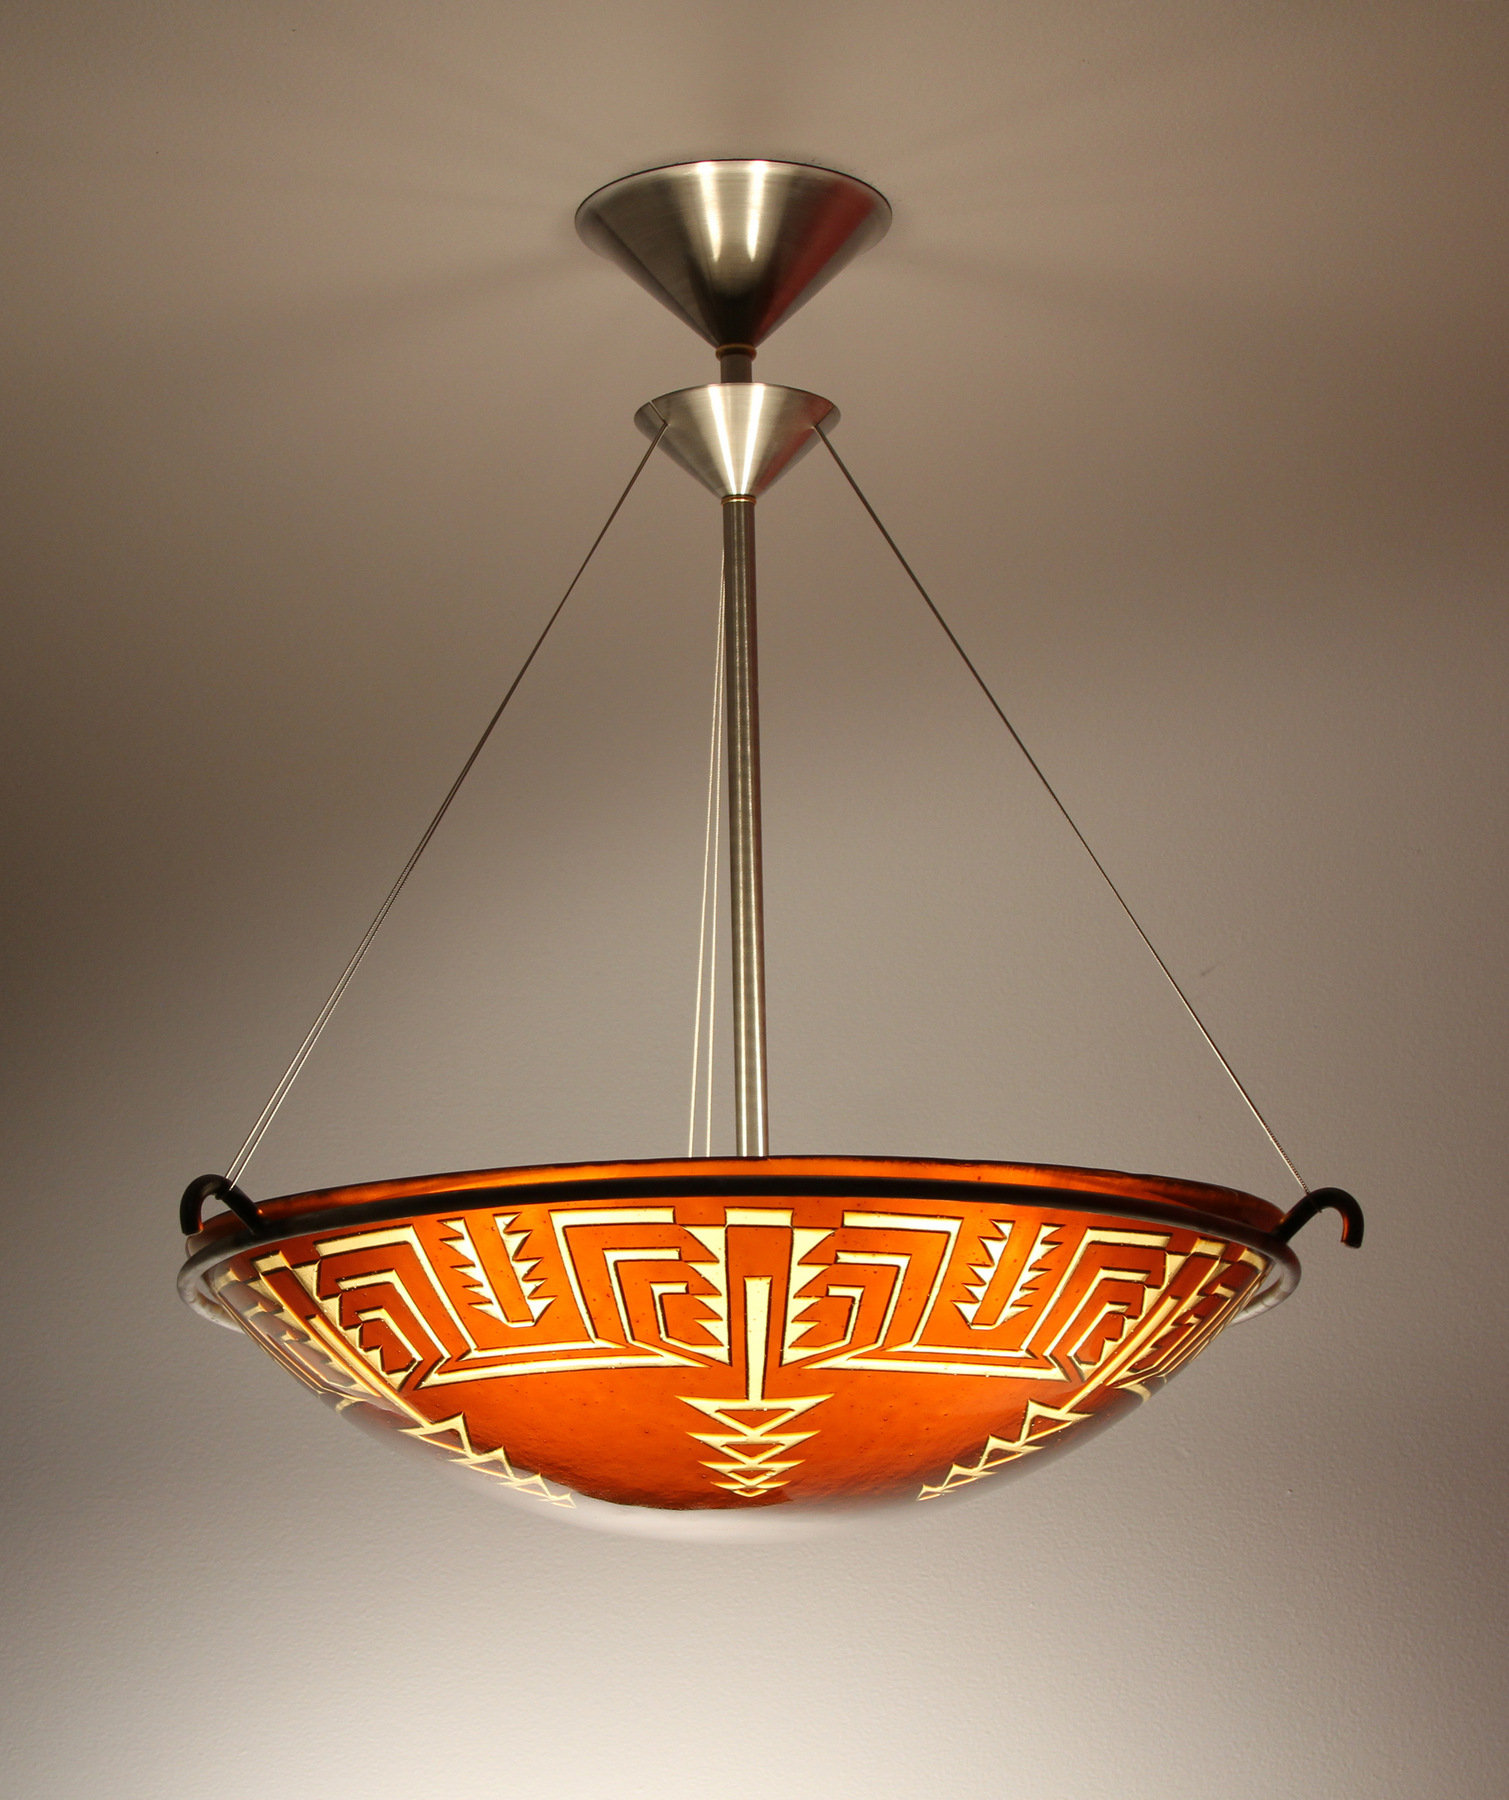 Pima Pendant Lamp By George Scott Art Glass Pendant Lamp